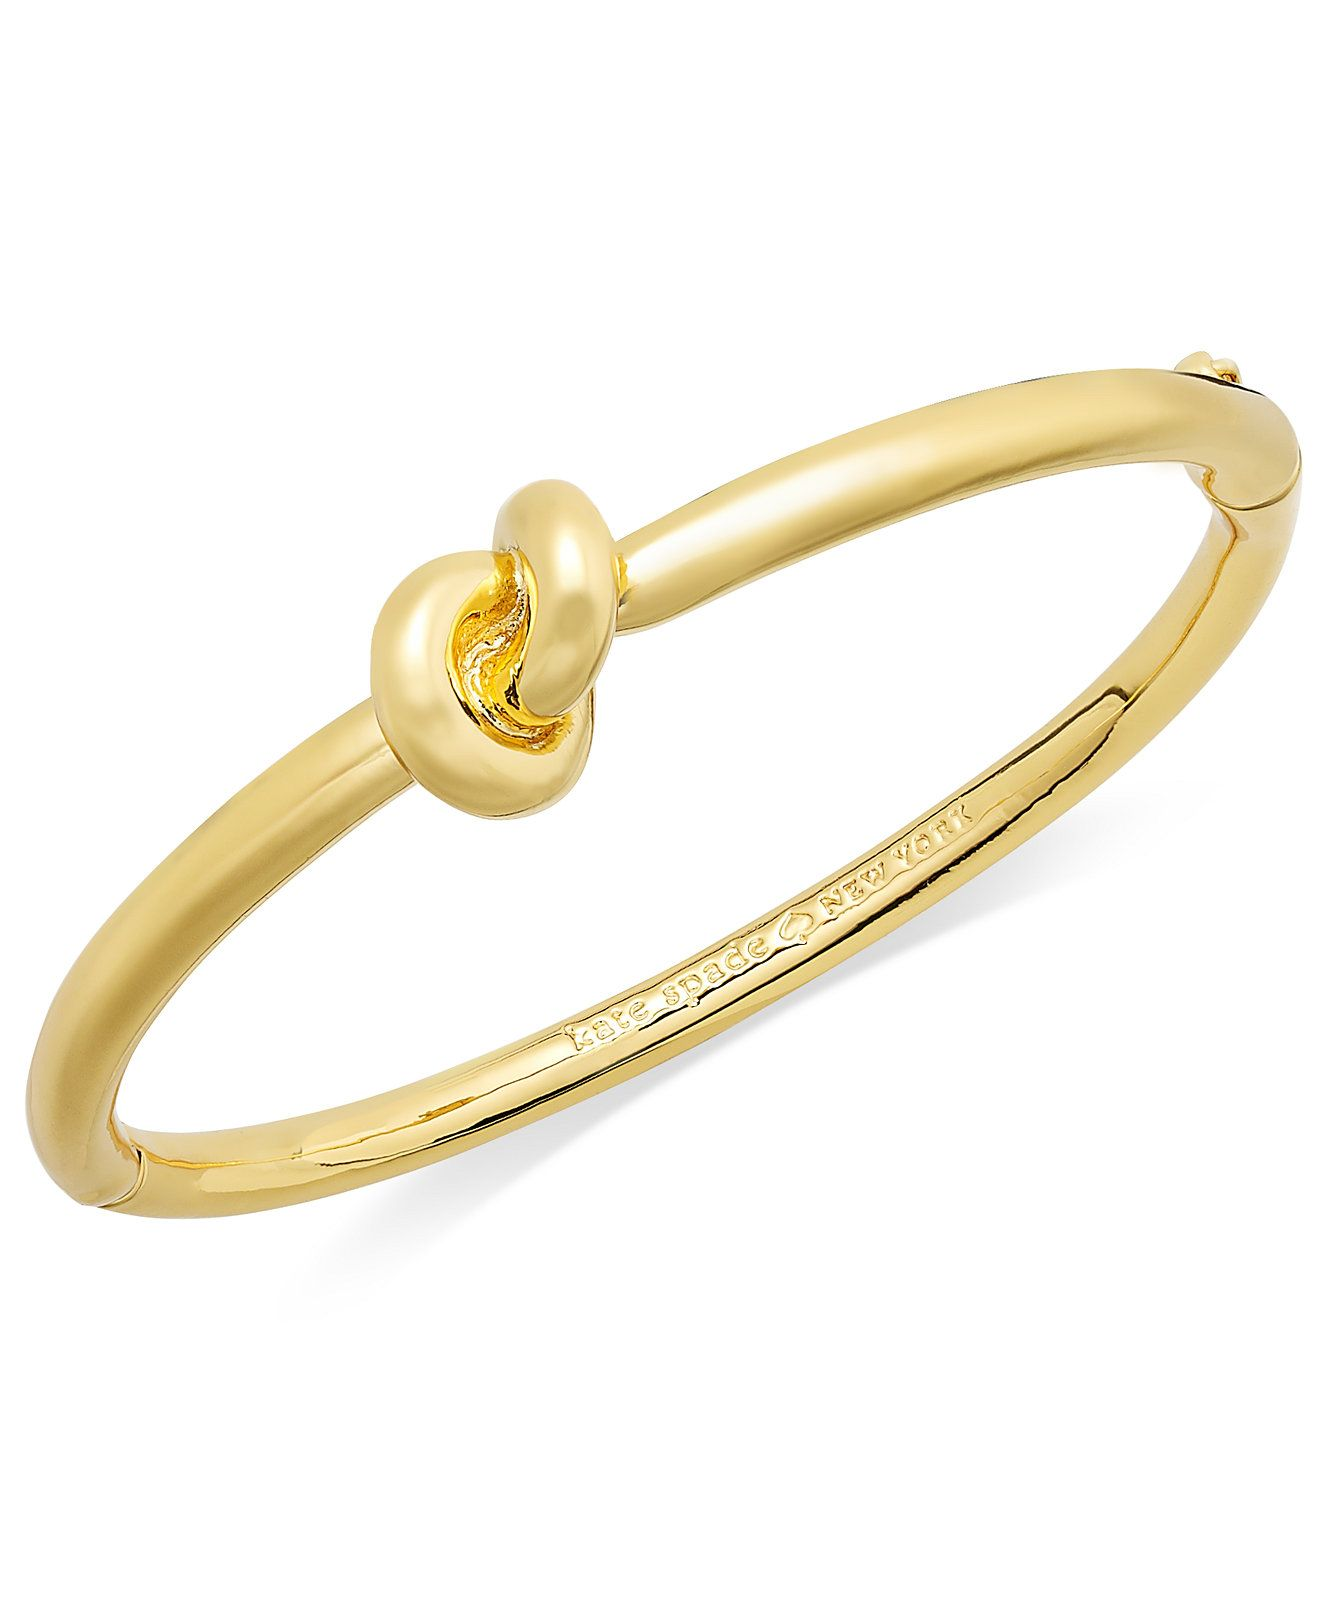 Bracelet sailorus knot hinge bangle bracelet totally new york